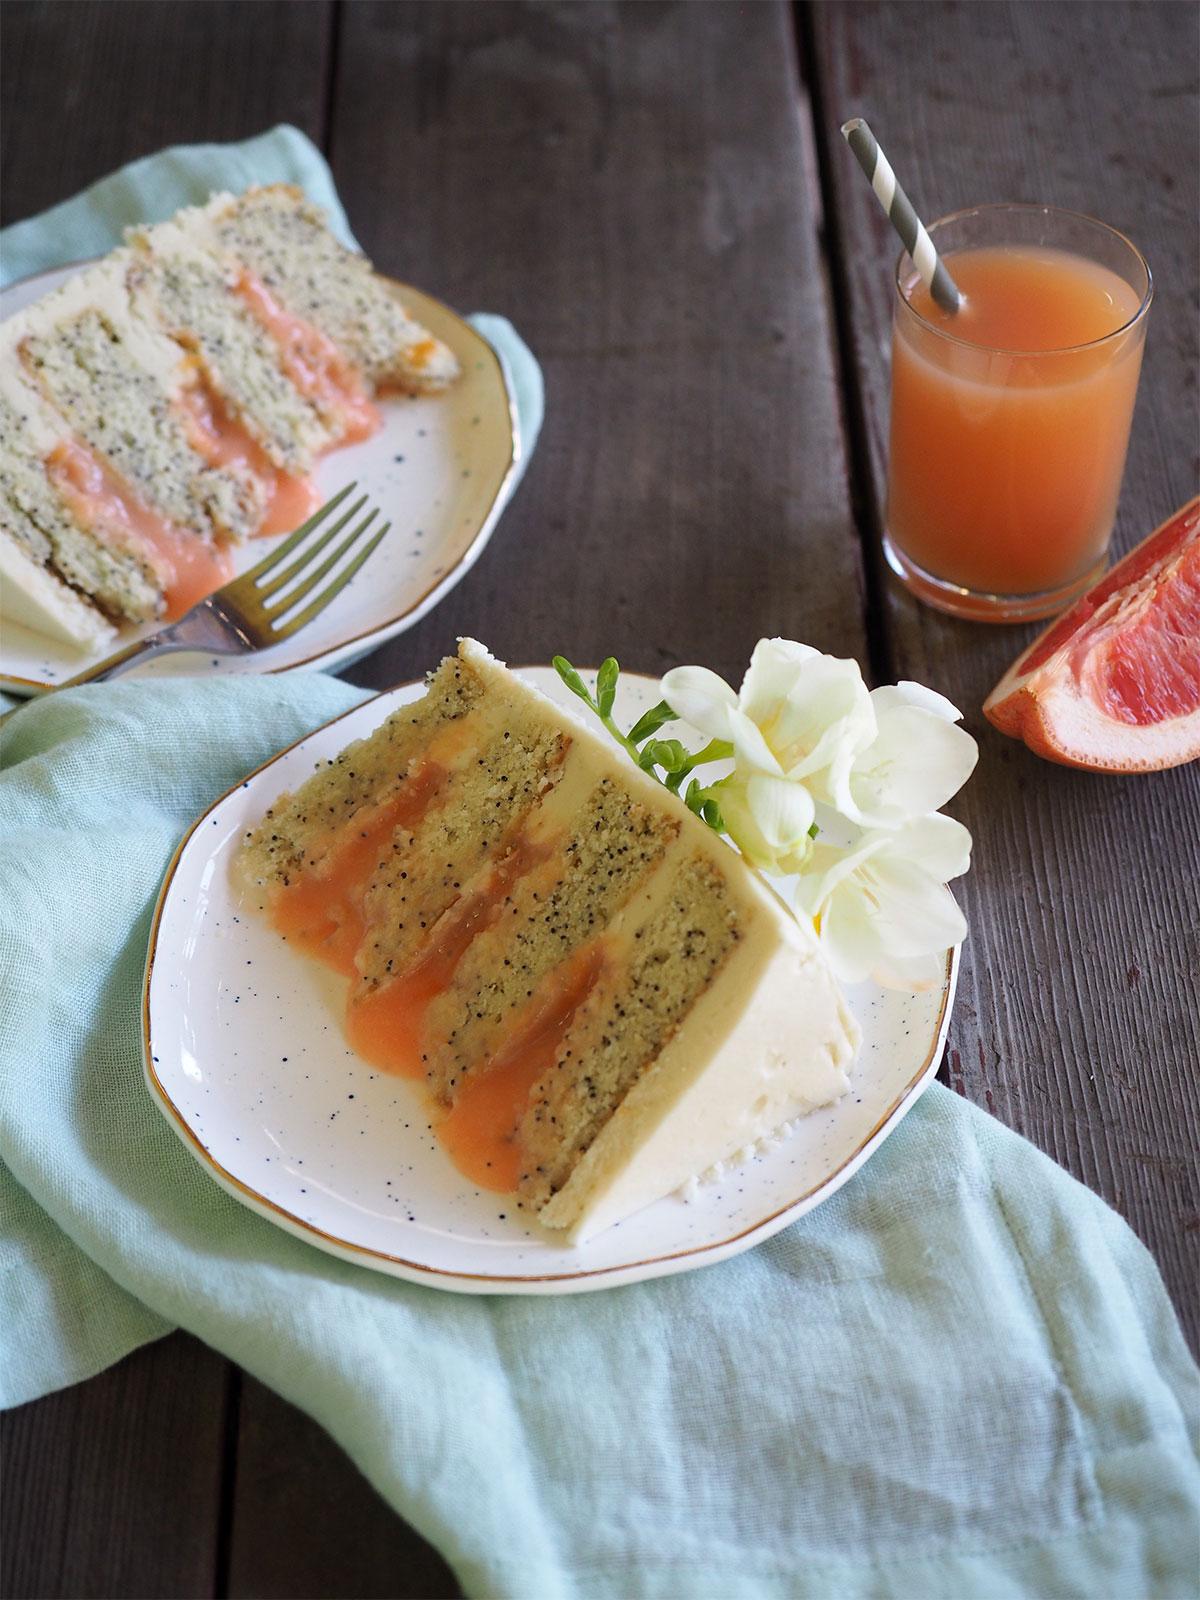 Chamomile Poppyseed Cake With Grapefruit Curd